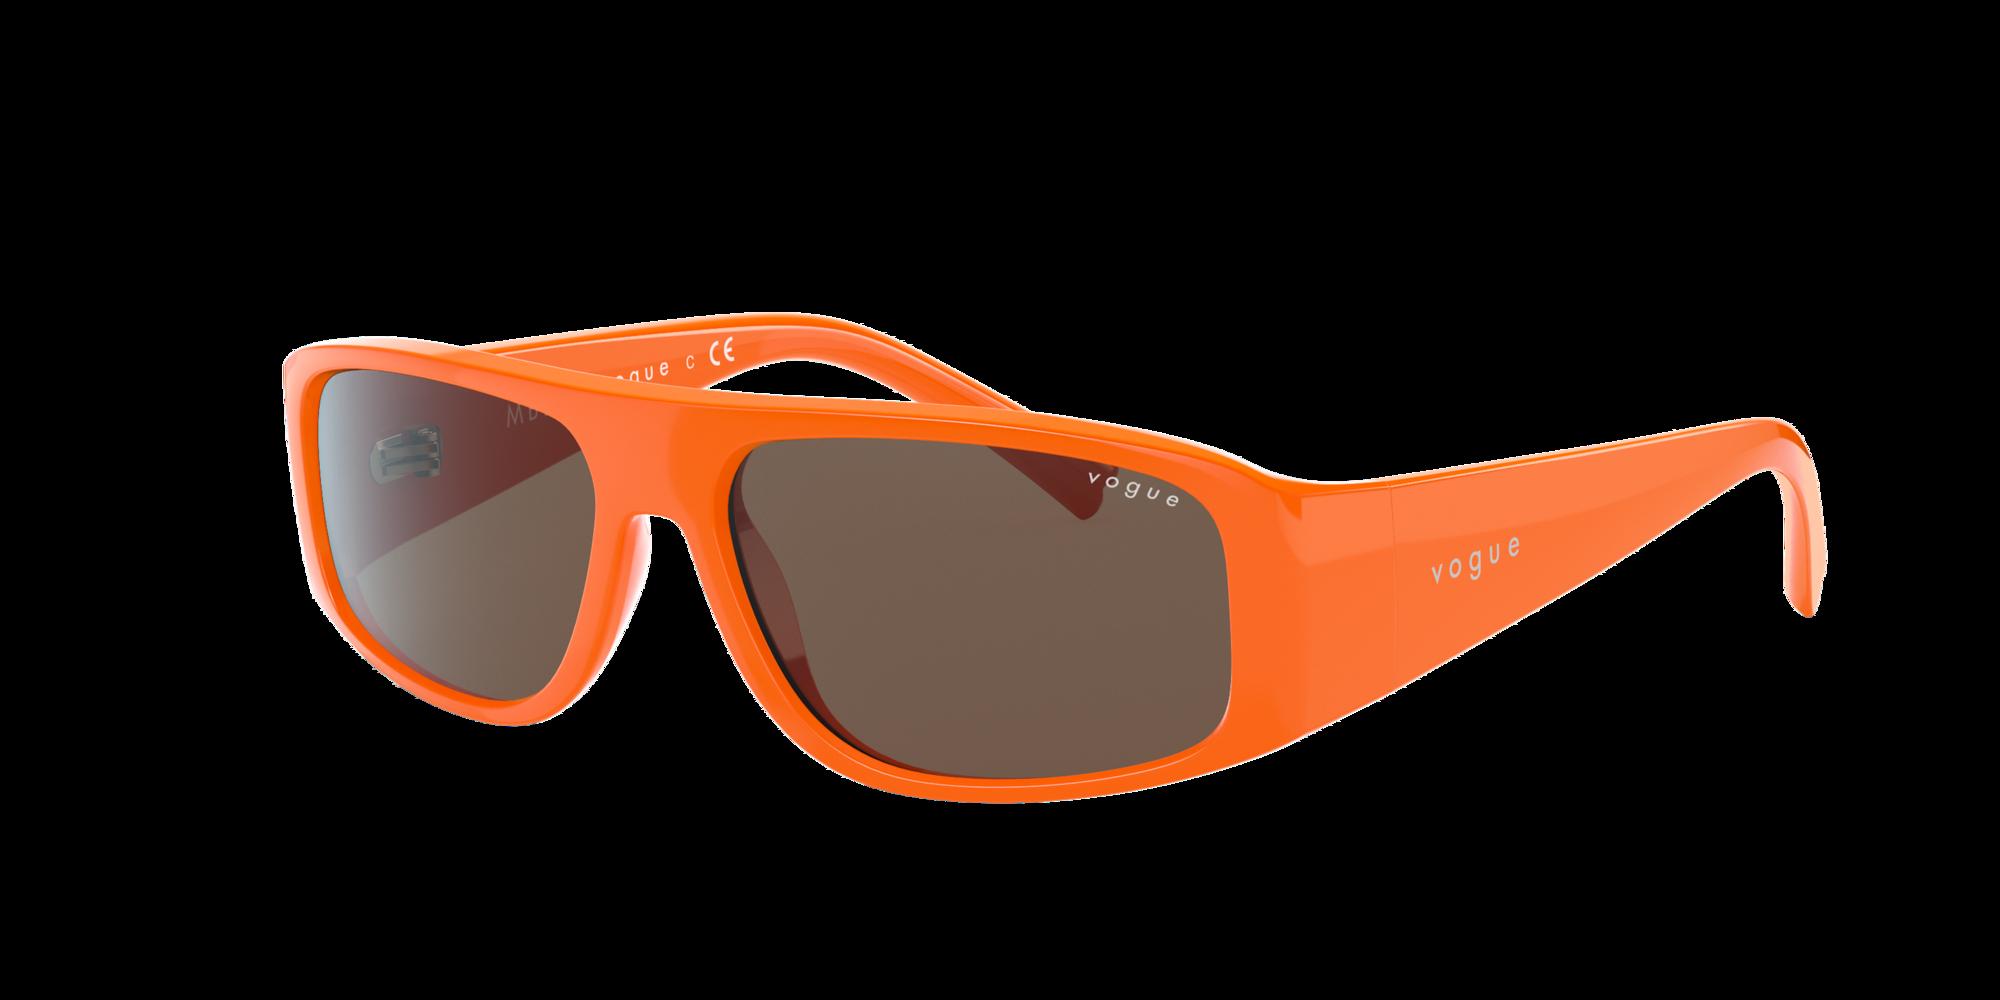 Vogue Eyewear Woman  VO5318S MBB X VOGUE EYEWEAR -  Frame color: Orange, Lens color: Brown